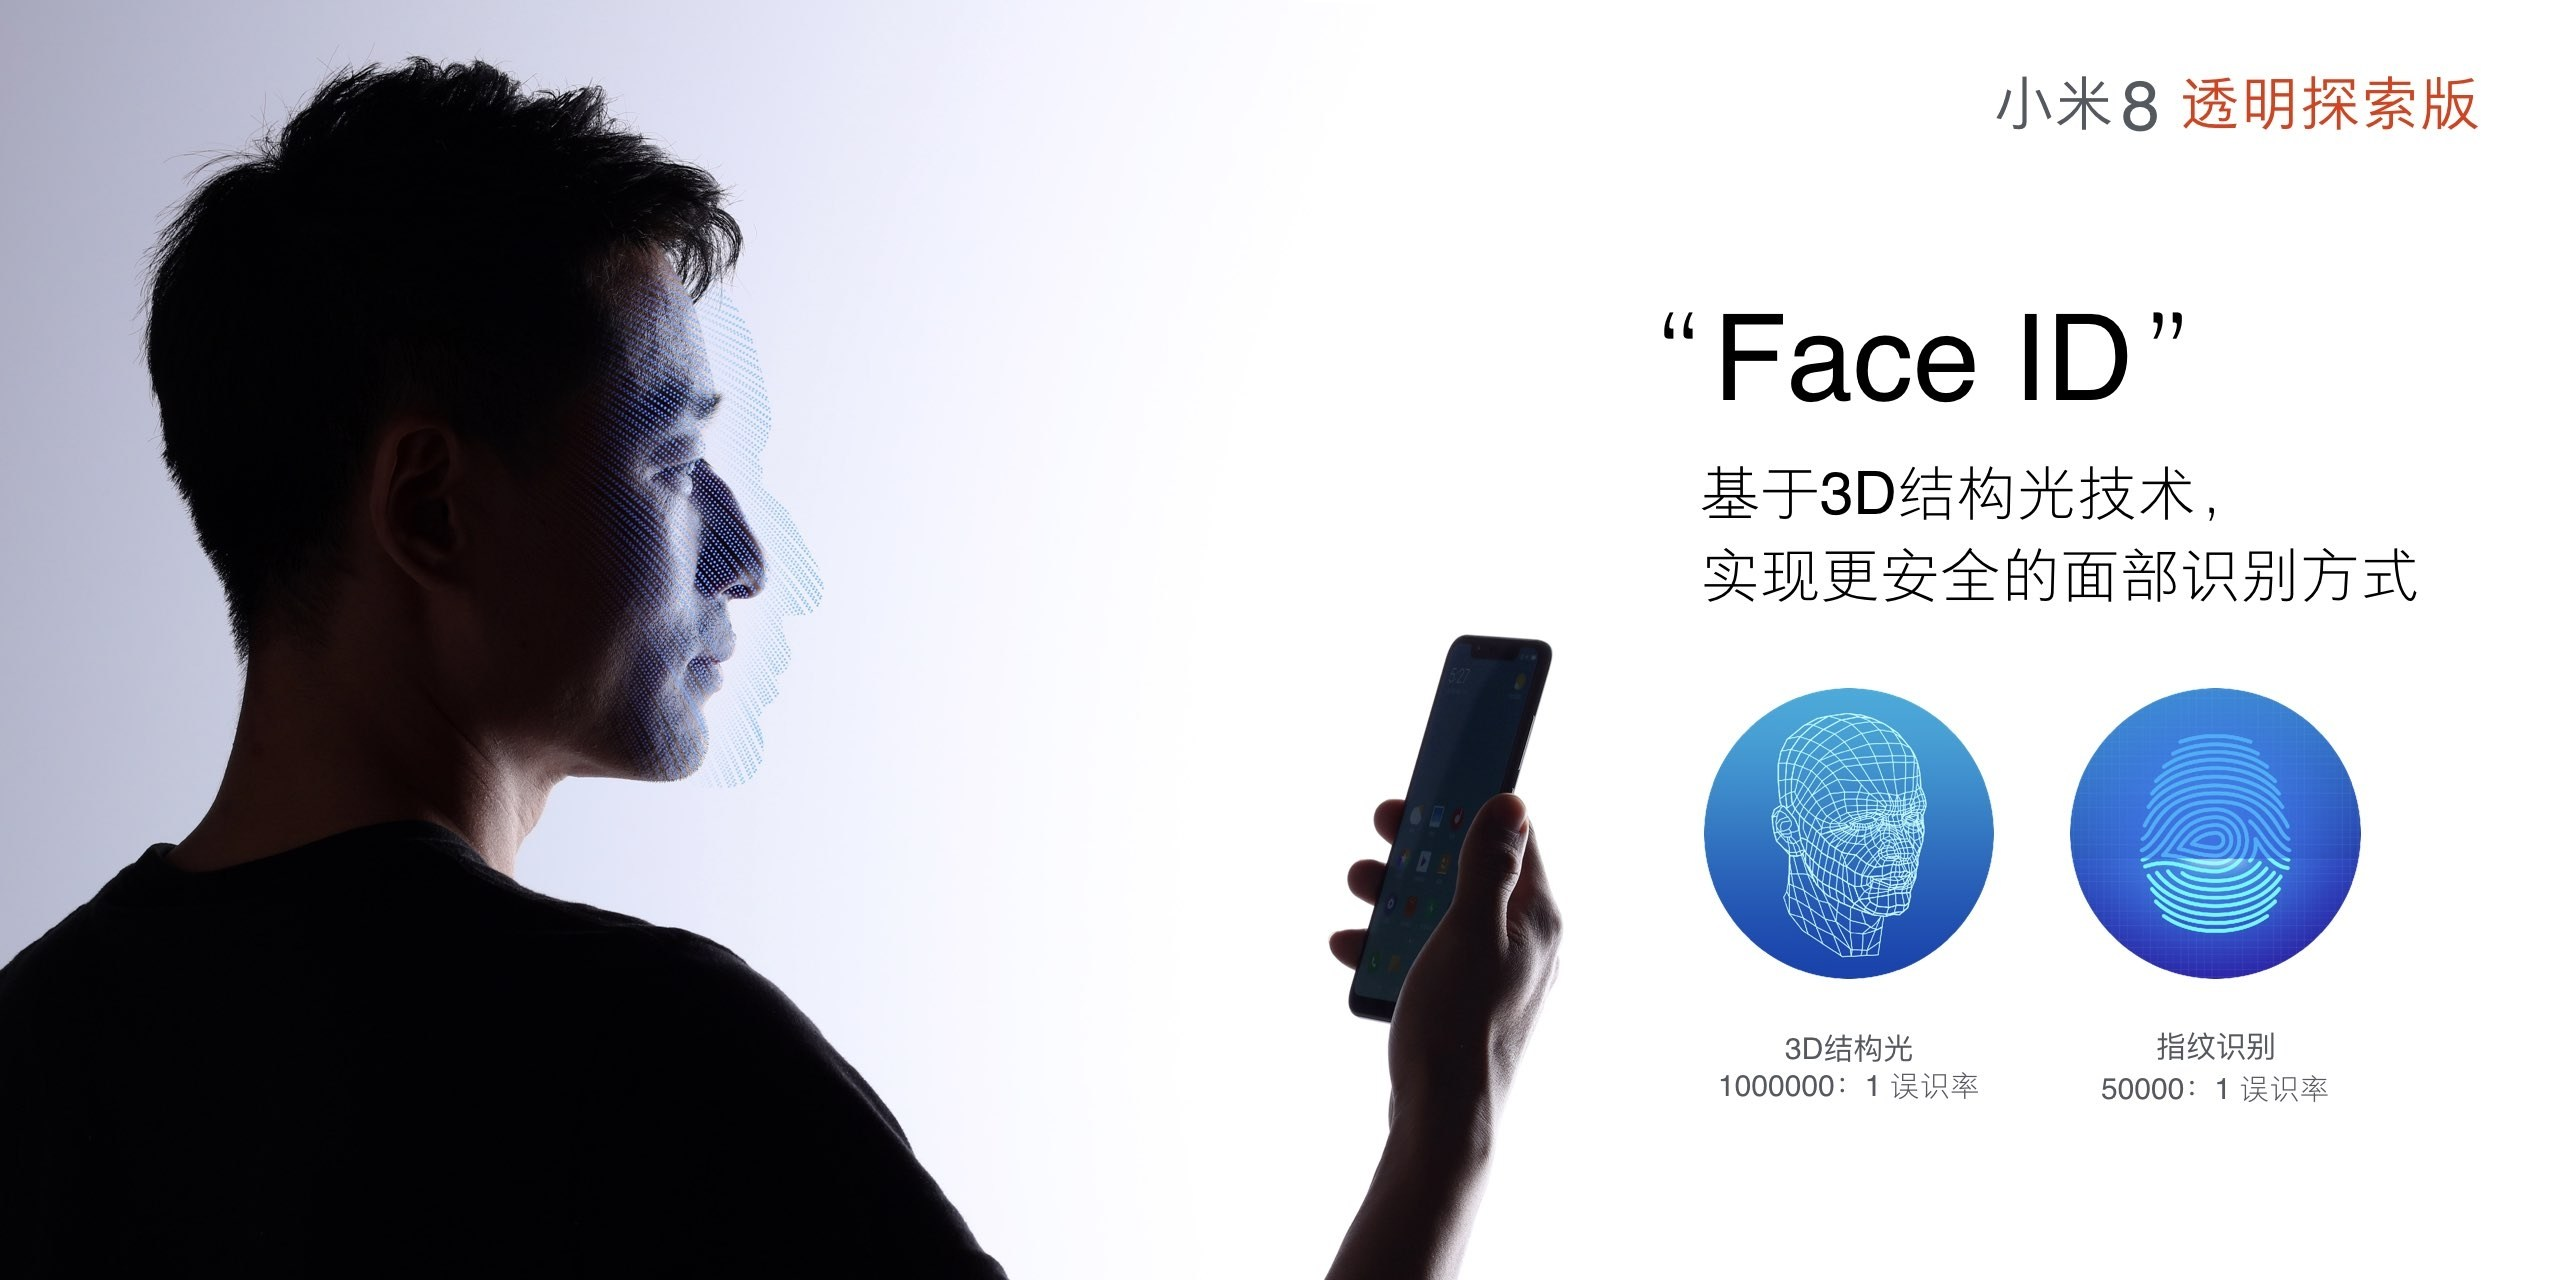 Xiaomi ne pourra pas utiliser «Face ID» en Europe pour son Mi 8